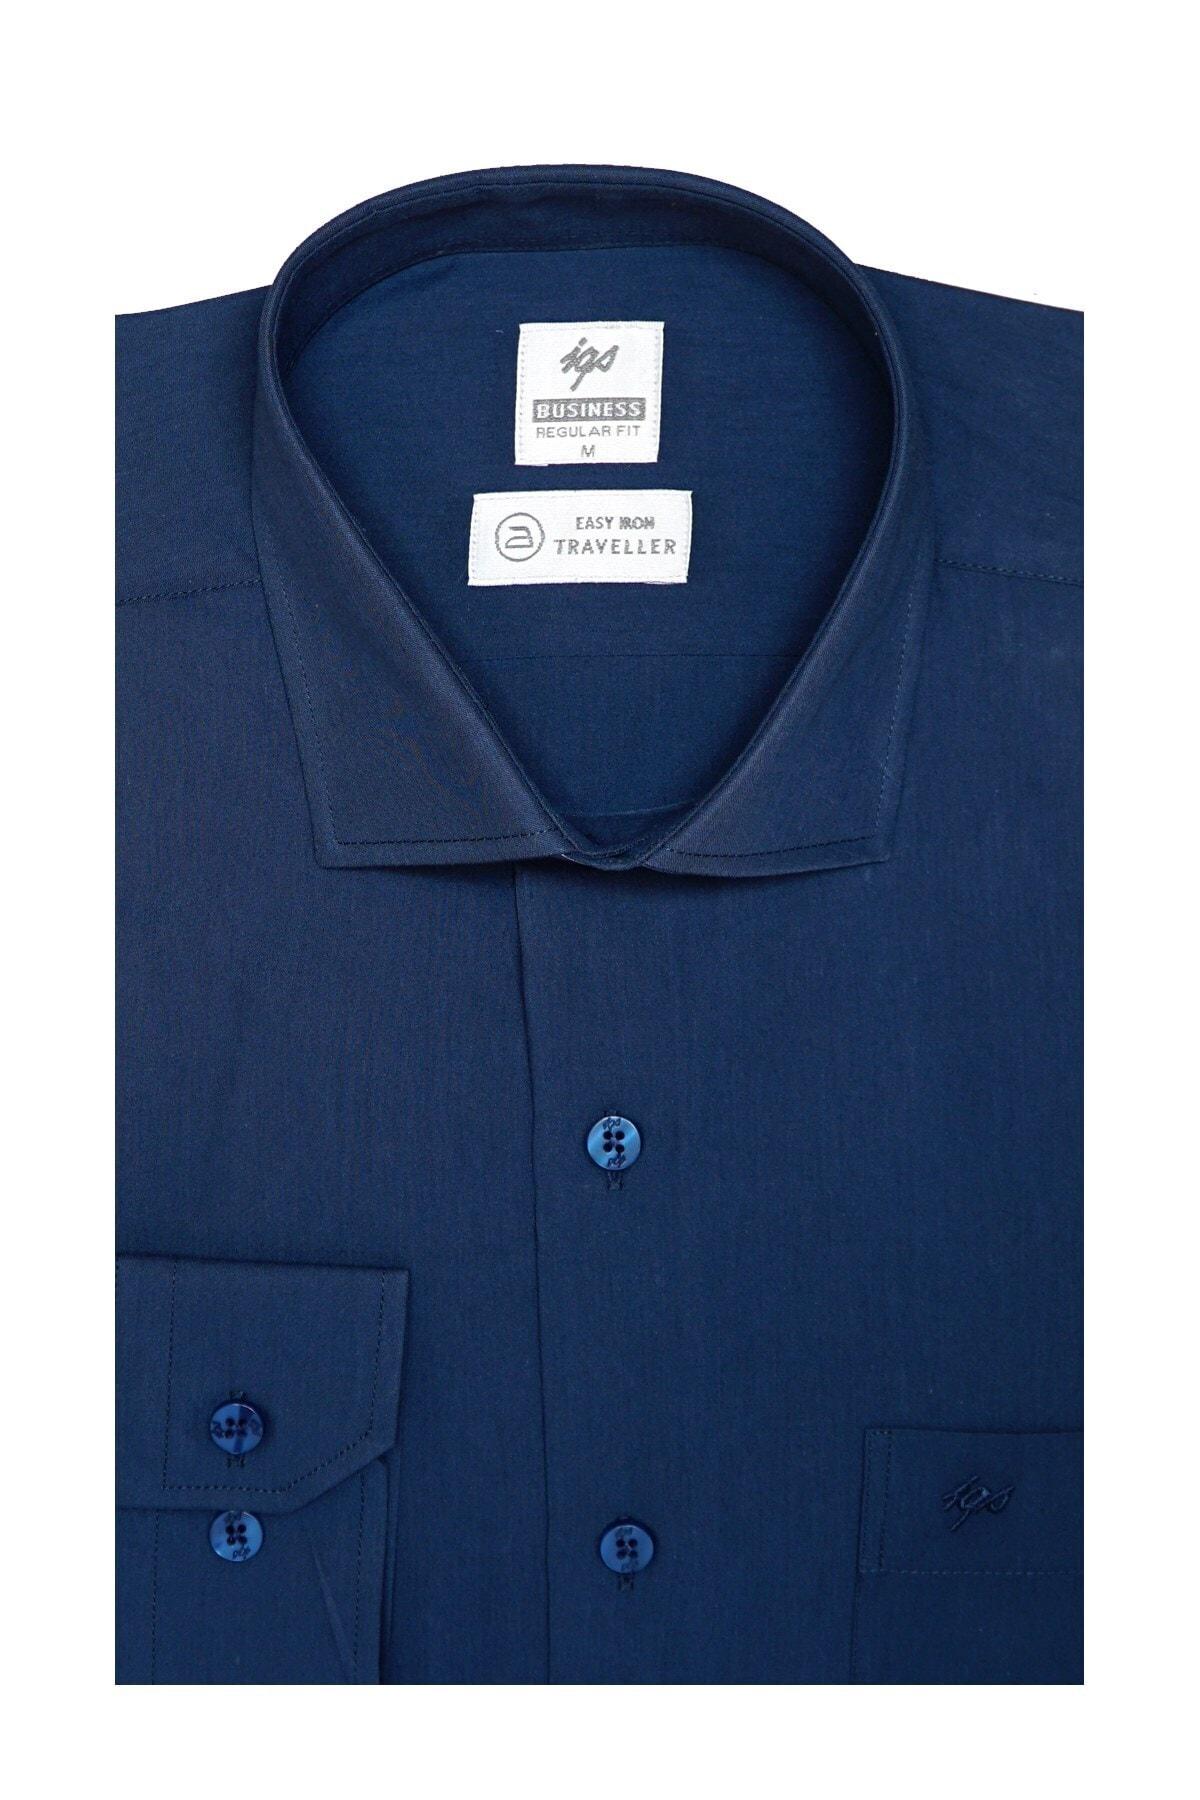 İgs Erkek Petrol Regularfıt / Rahat Kalıp 7 Cm Klasik Gömlek 1